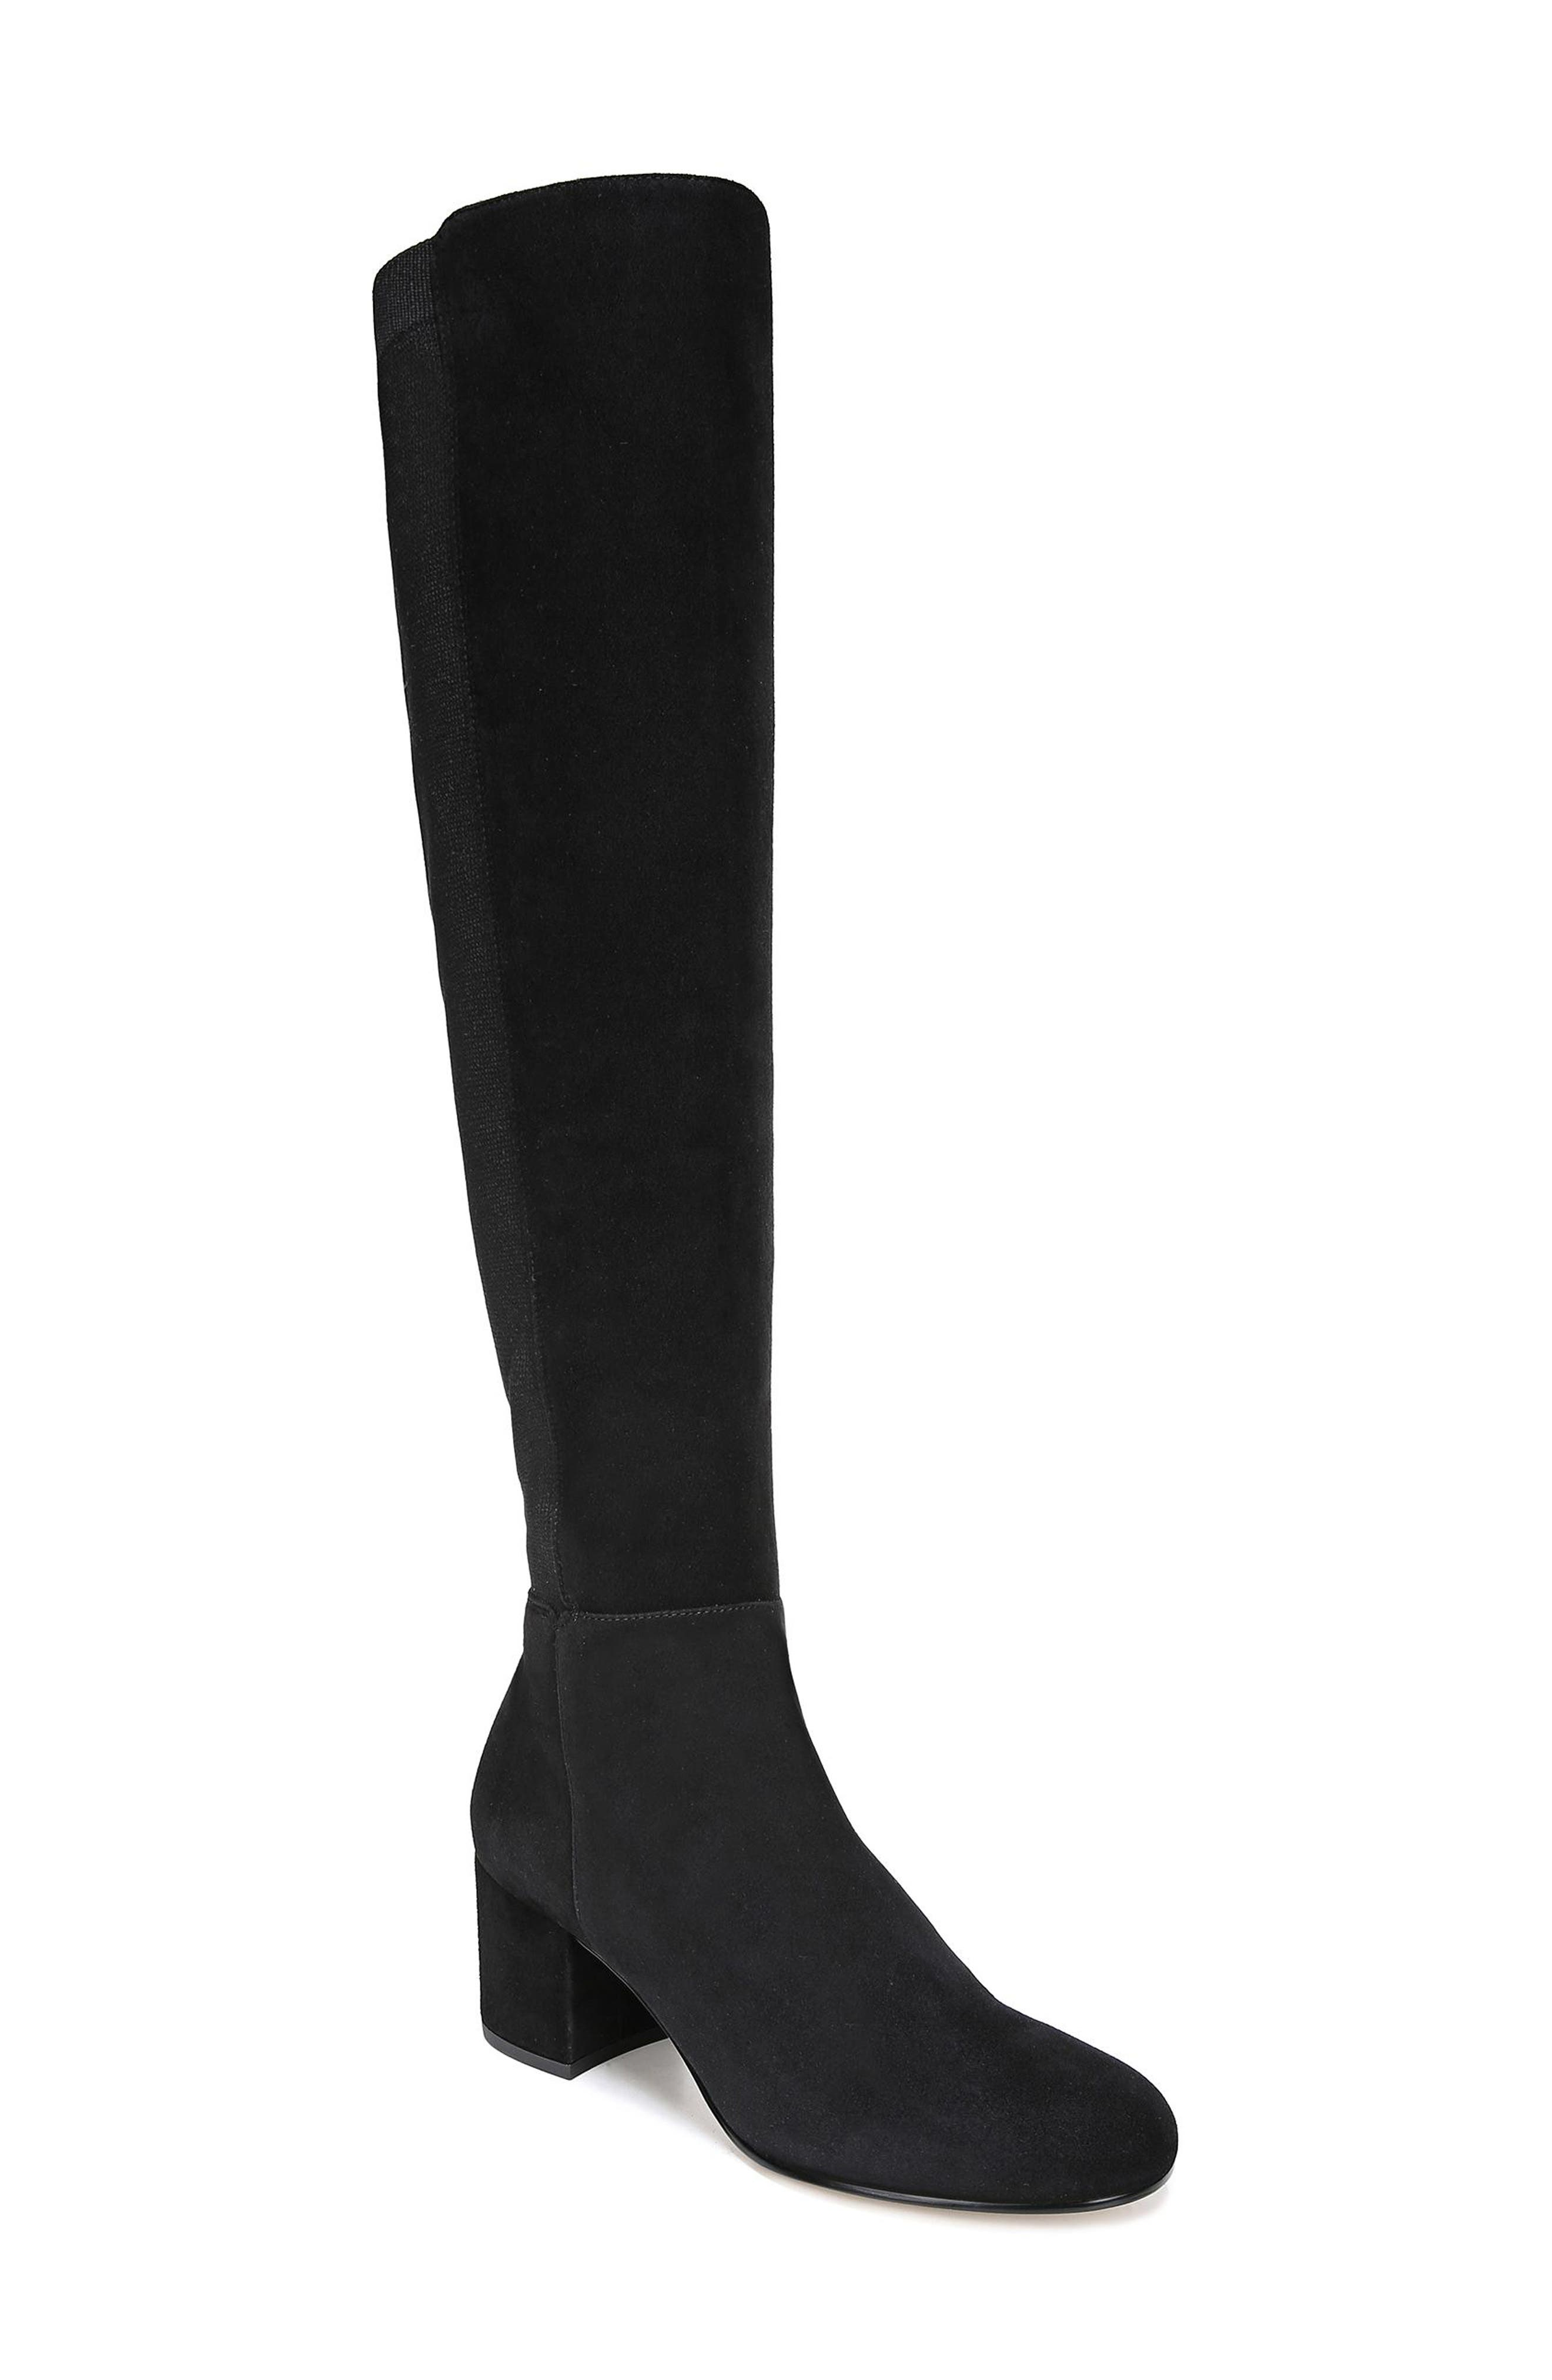 Valda Knee High Boot by Sam Edelman